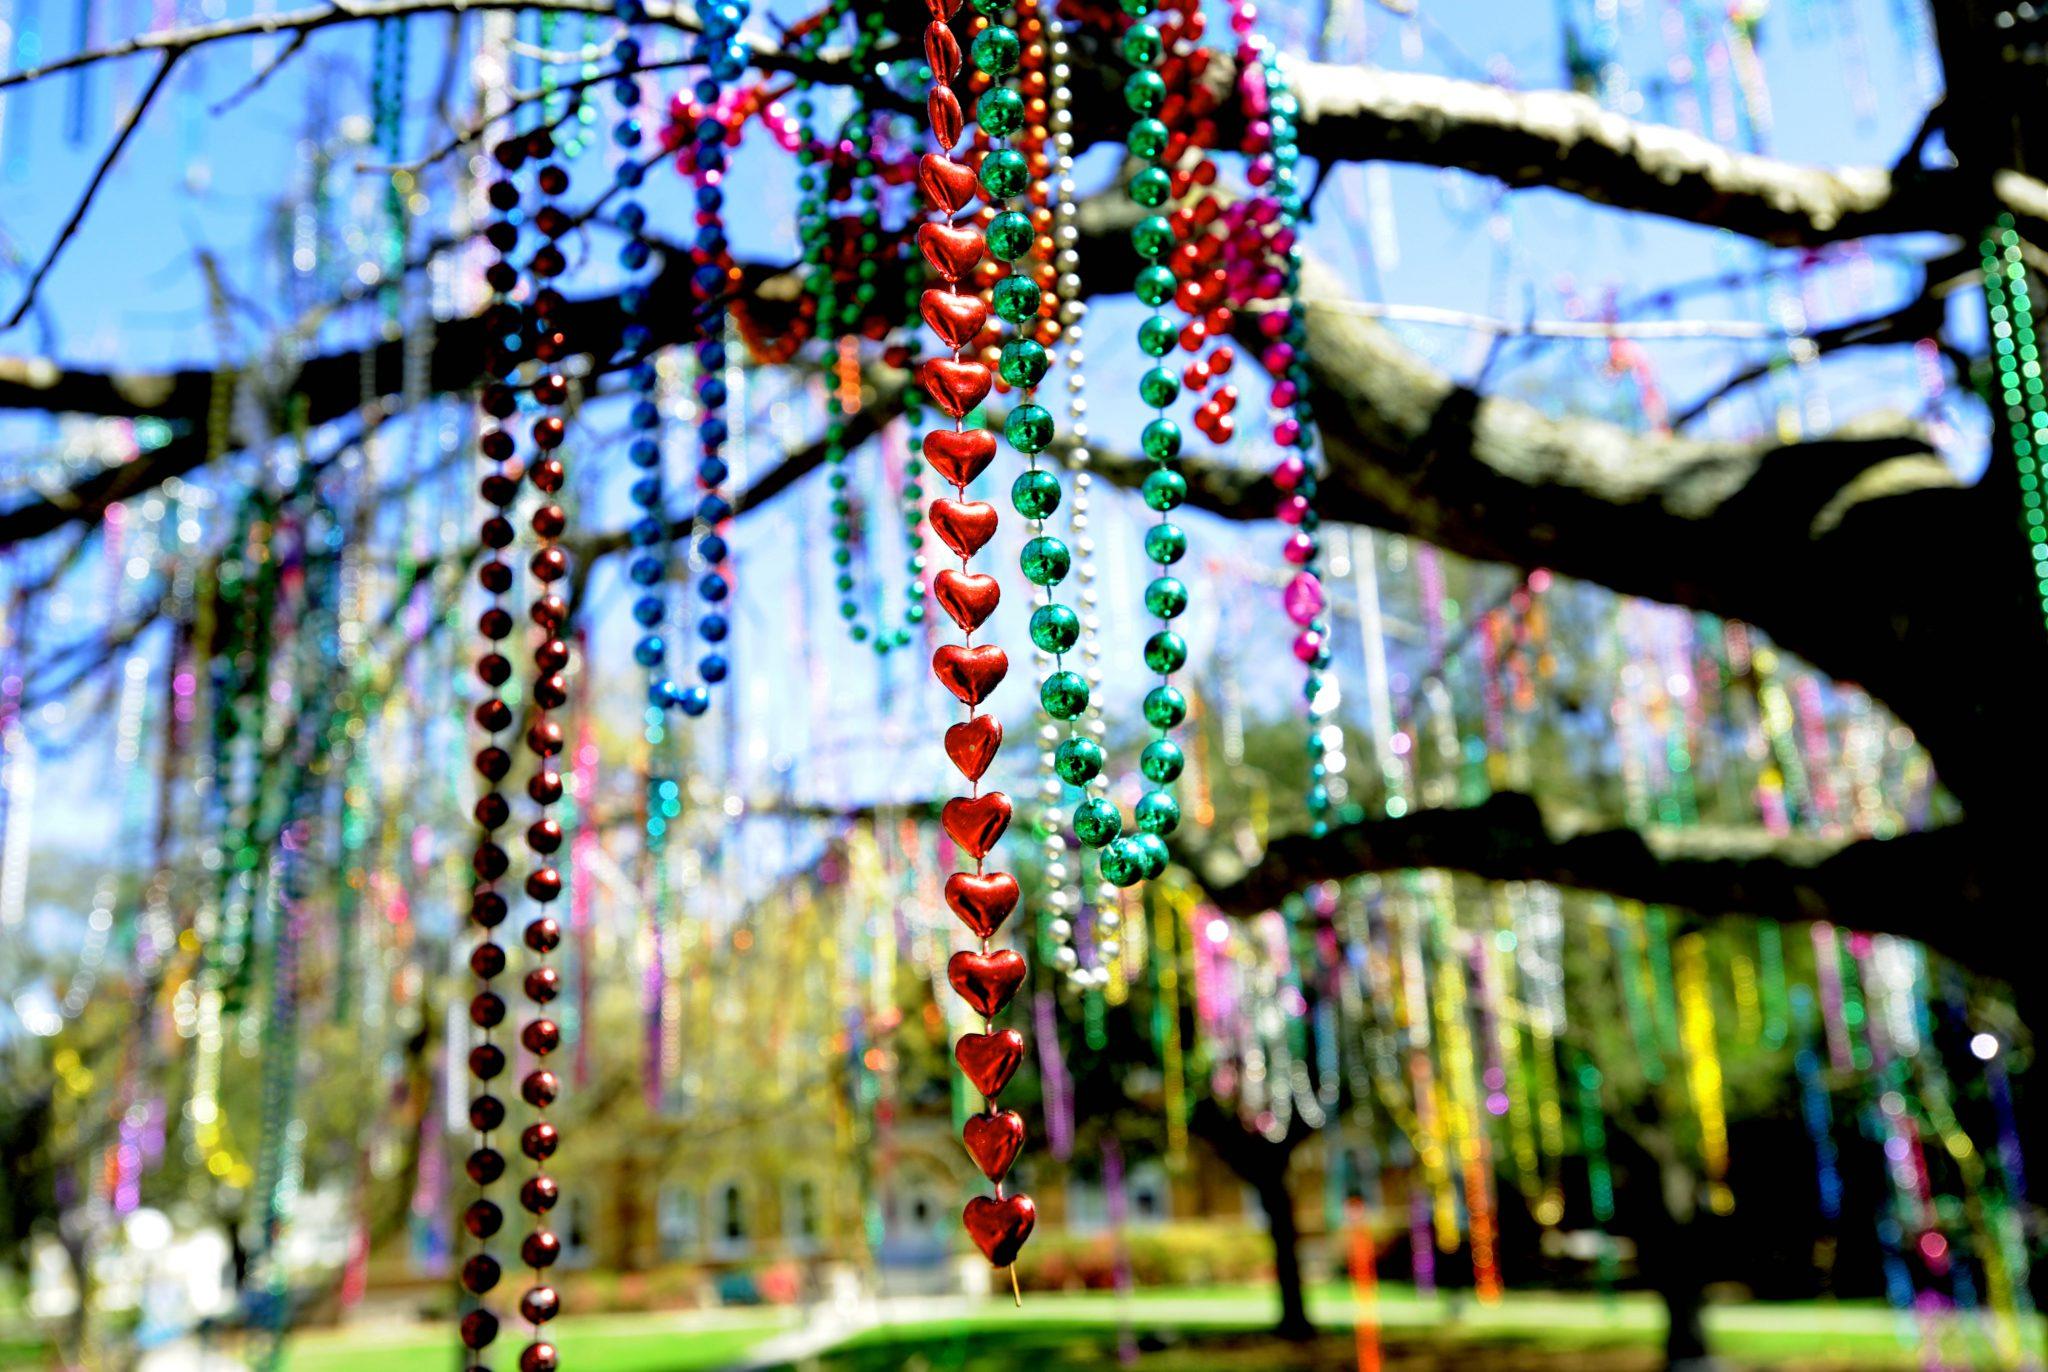 Mardi Gras Bead Tree.jpg